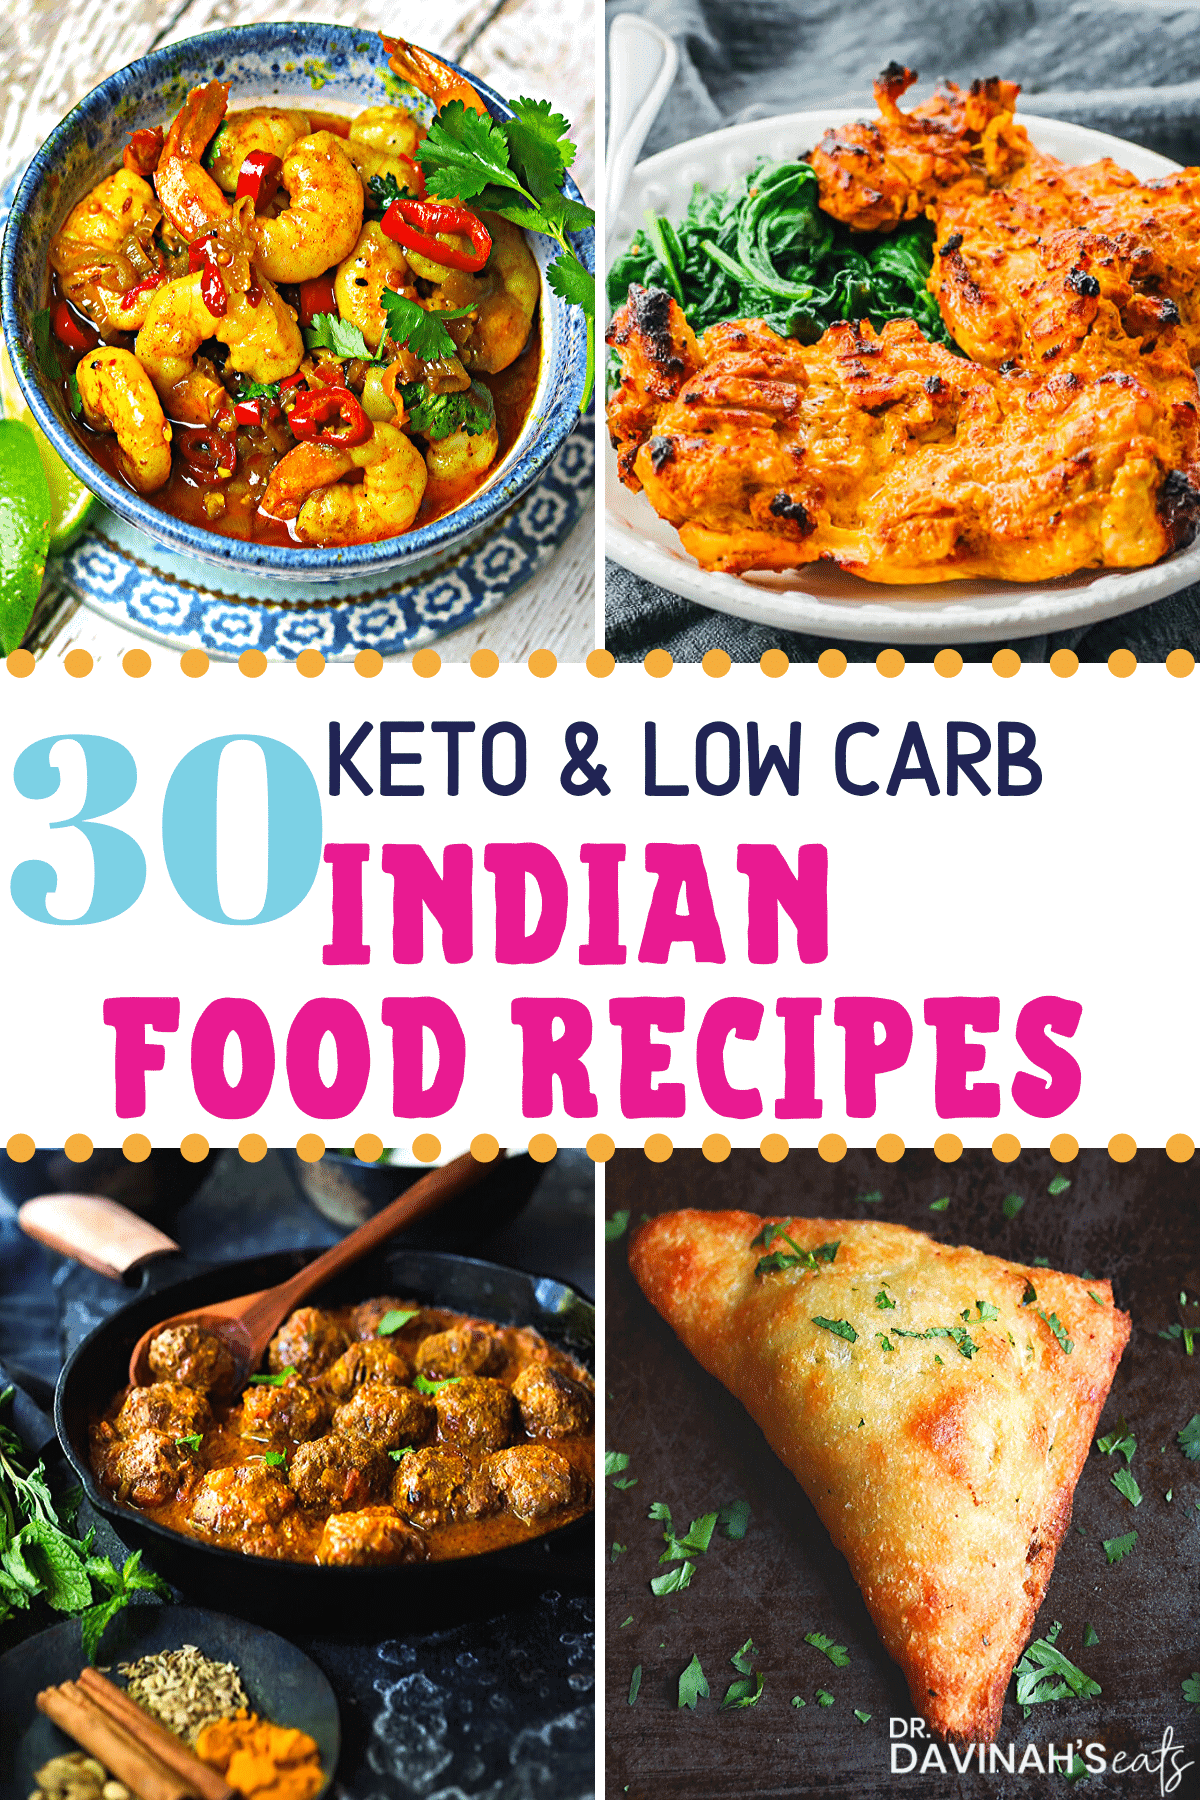 Pinterest image for Keto Indian food